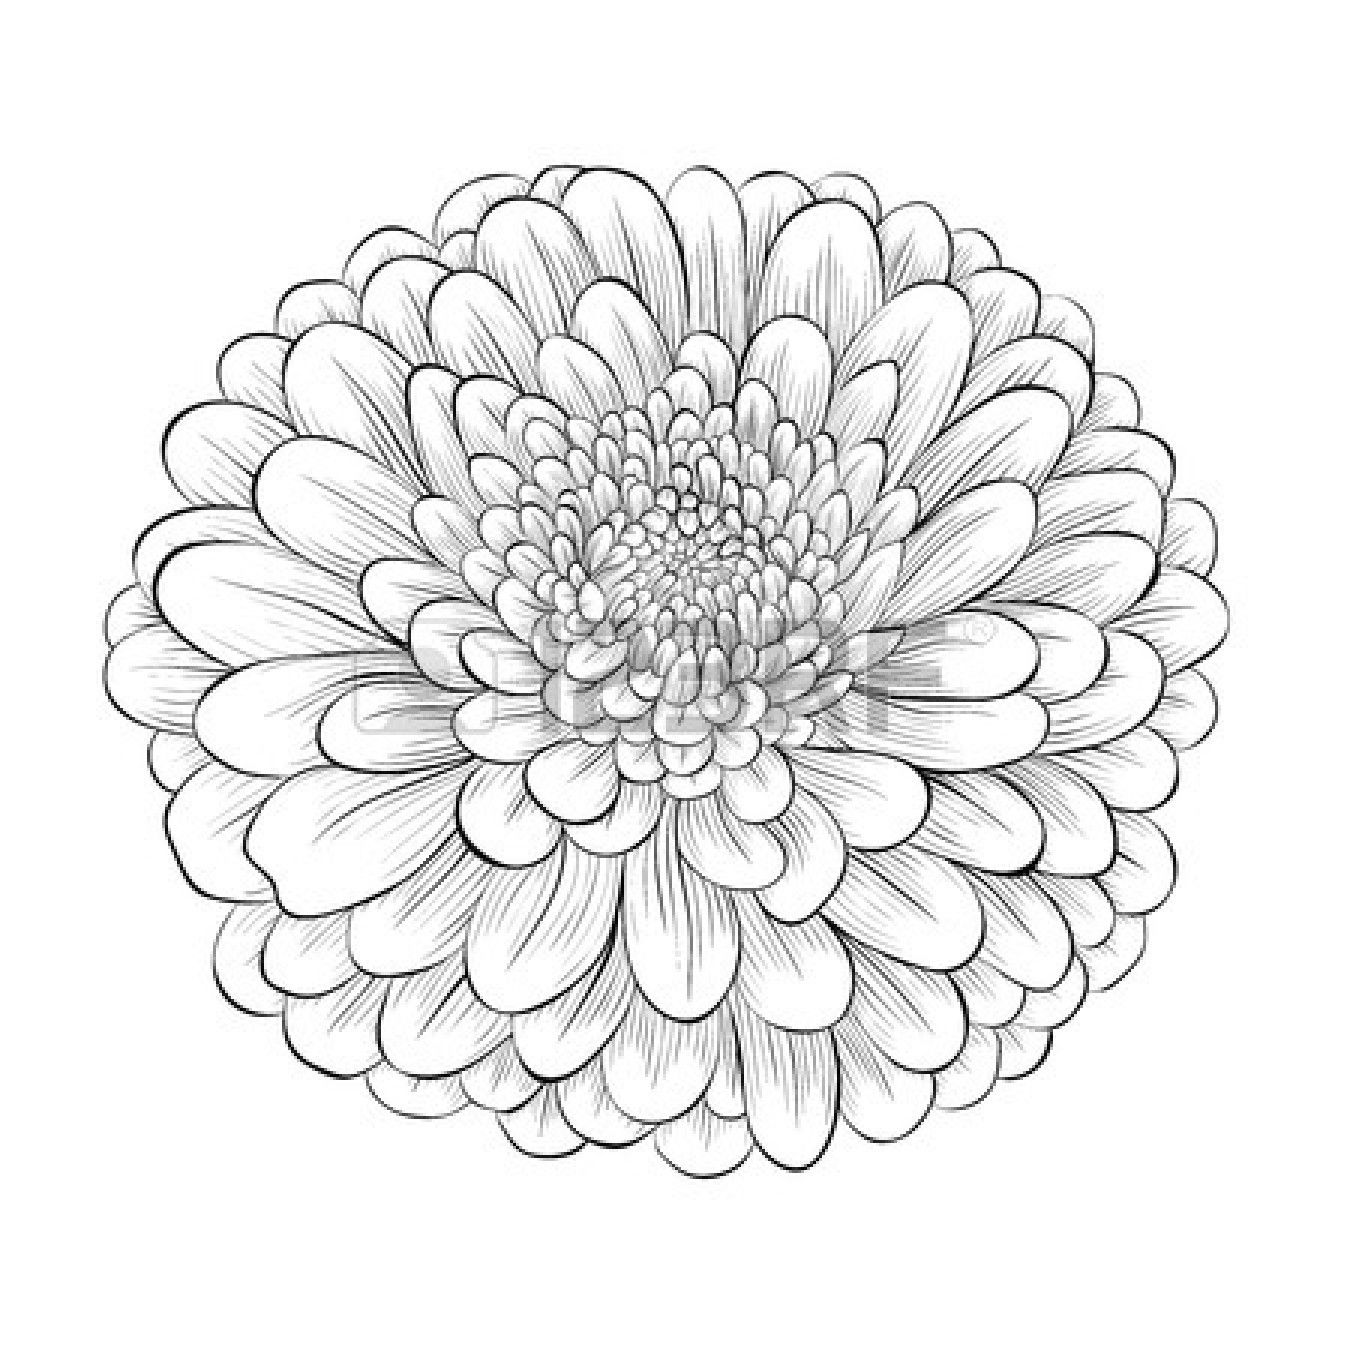 aster flower sept birth flower tattoo ideas = Pinterest